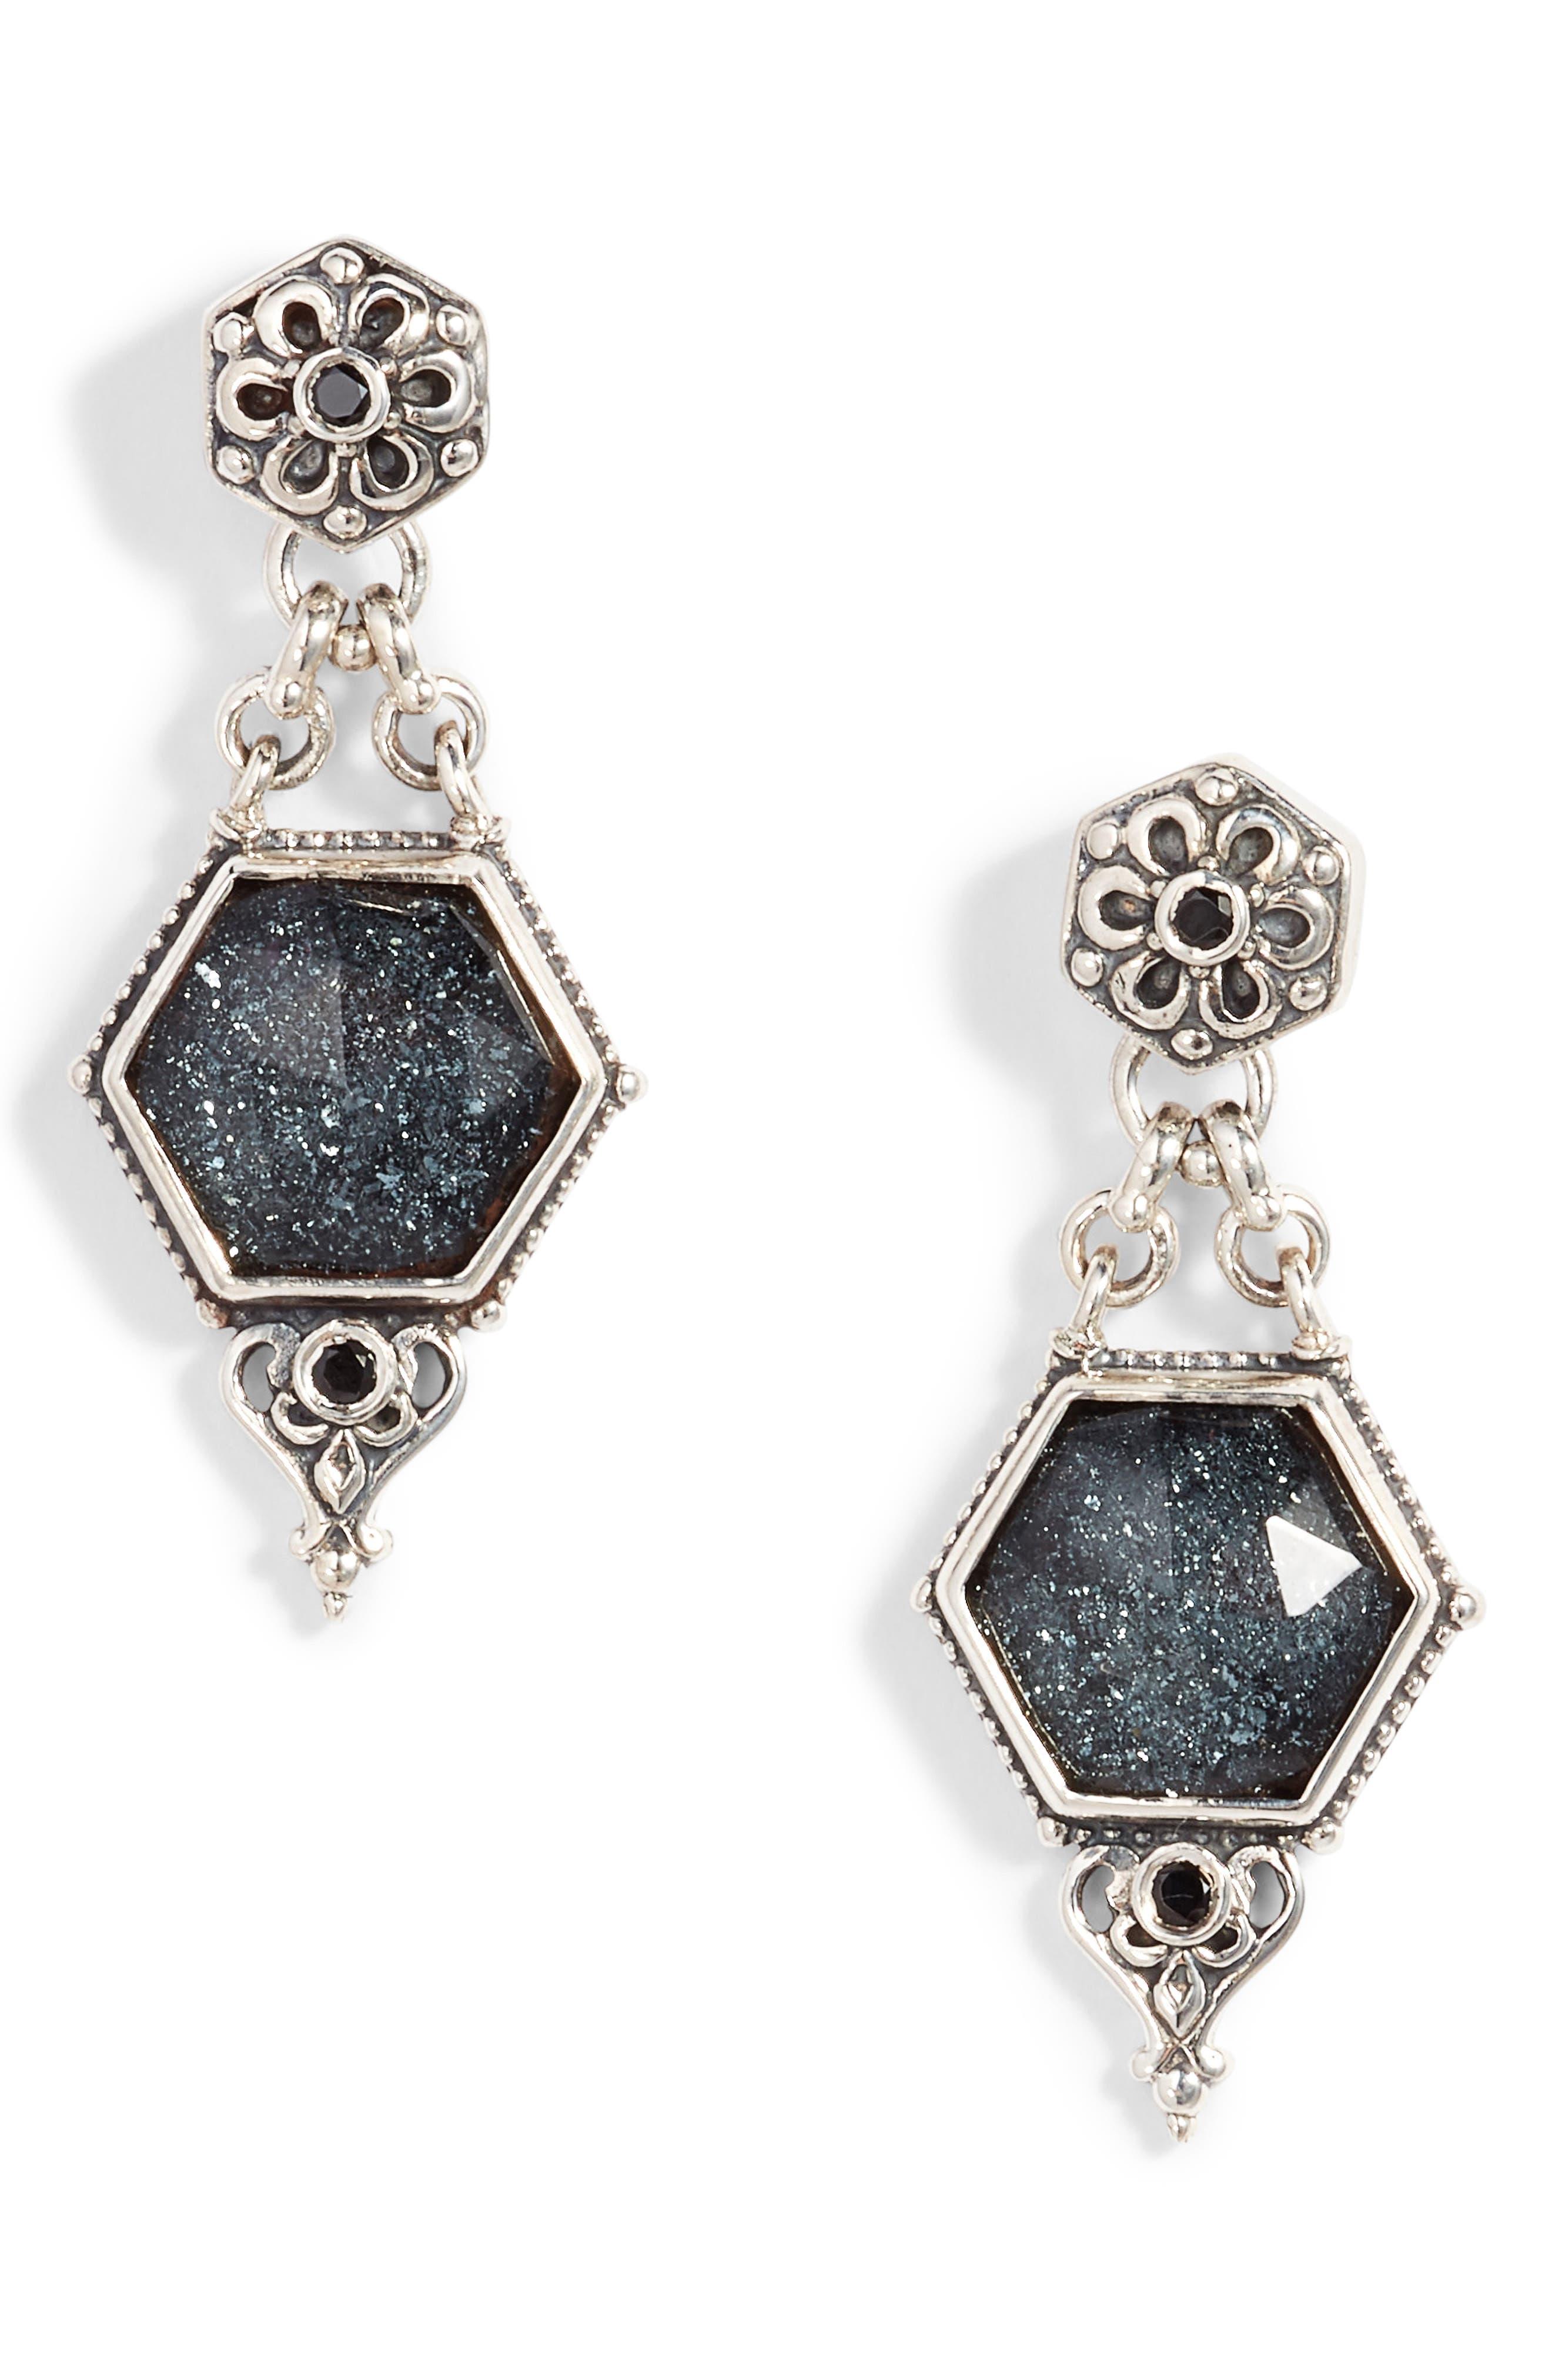 Santorini Hematite Octogan Drop Earrings,                         Main,                         color, SILVER/ HEMATITE